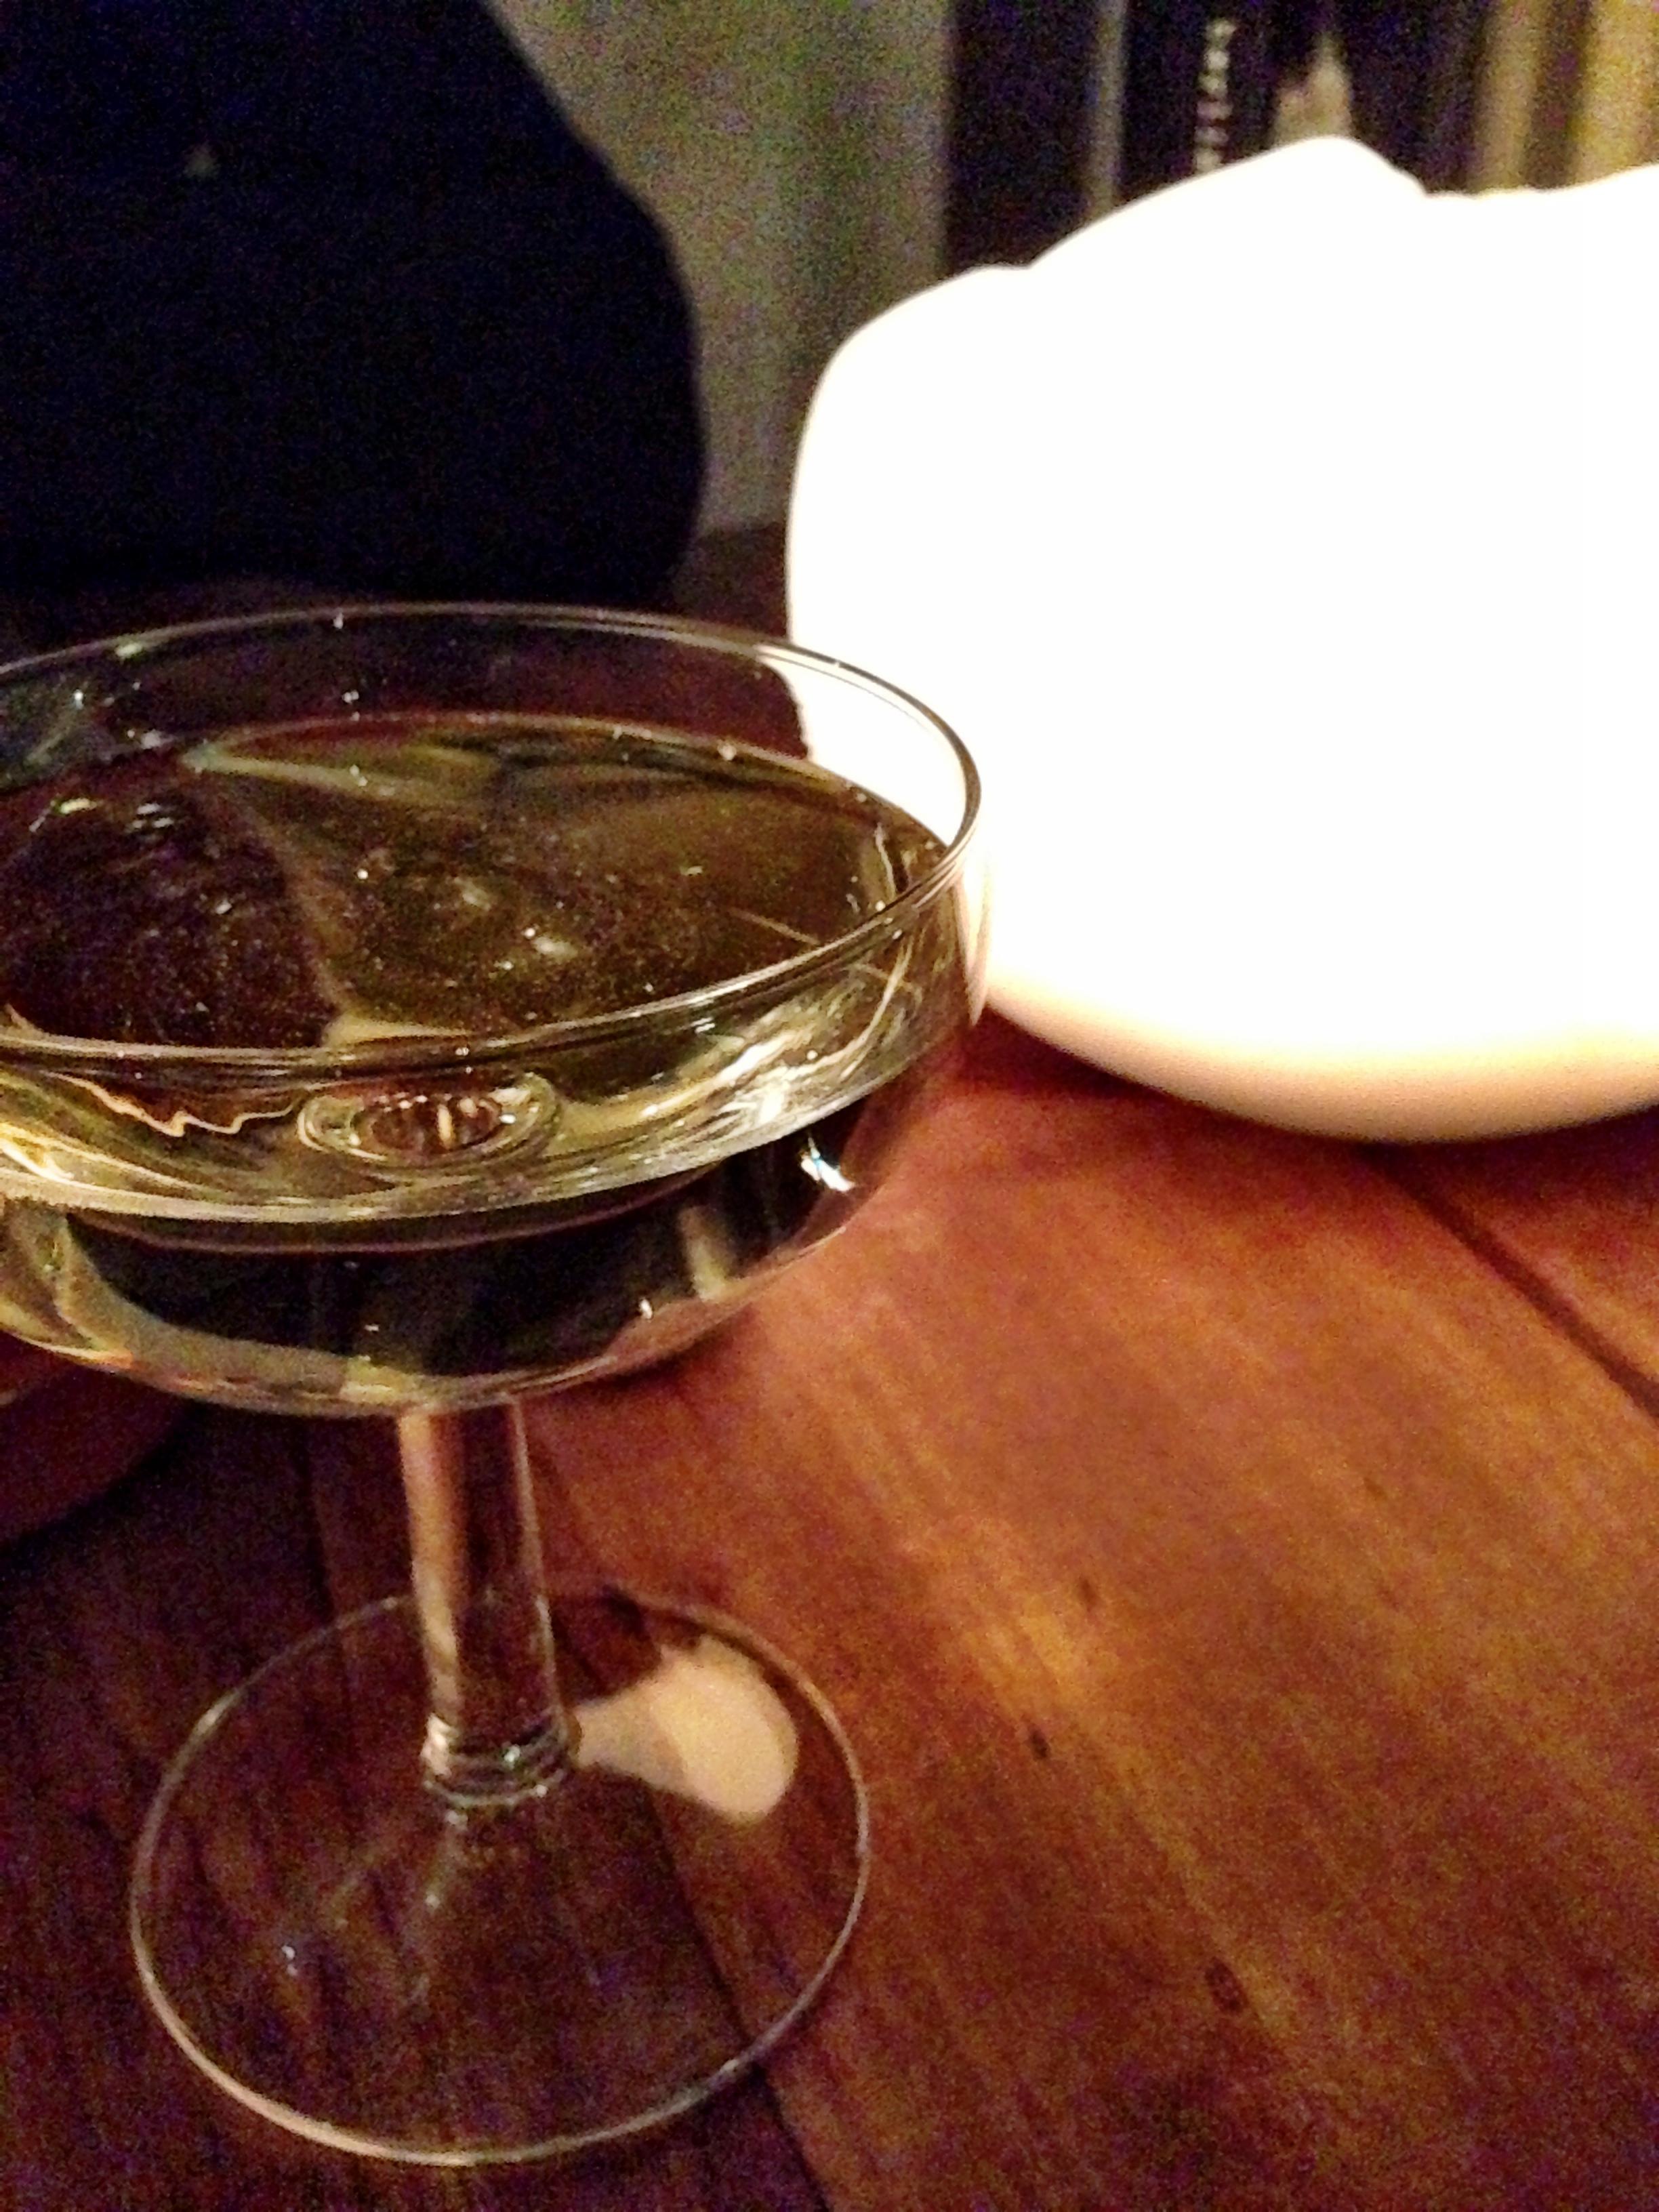 Bar RavalDate Night Blog   Date Night Blog